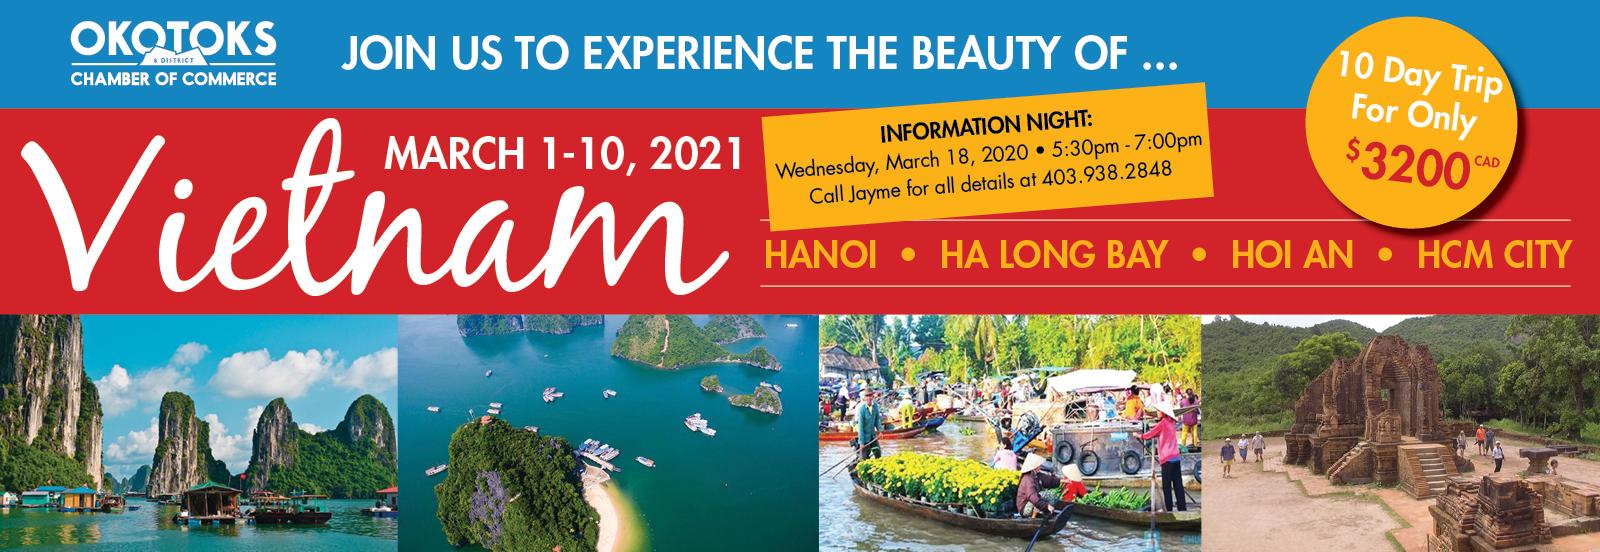 OC-WEB-VietnamBanner.jpg